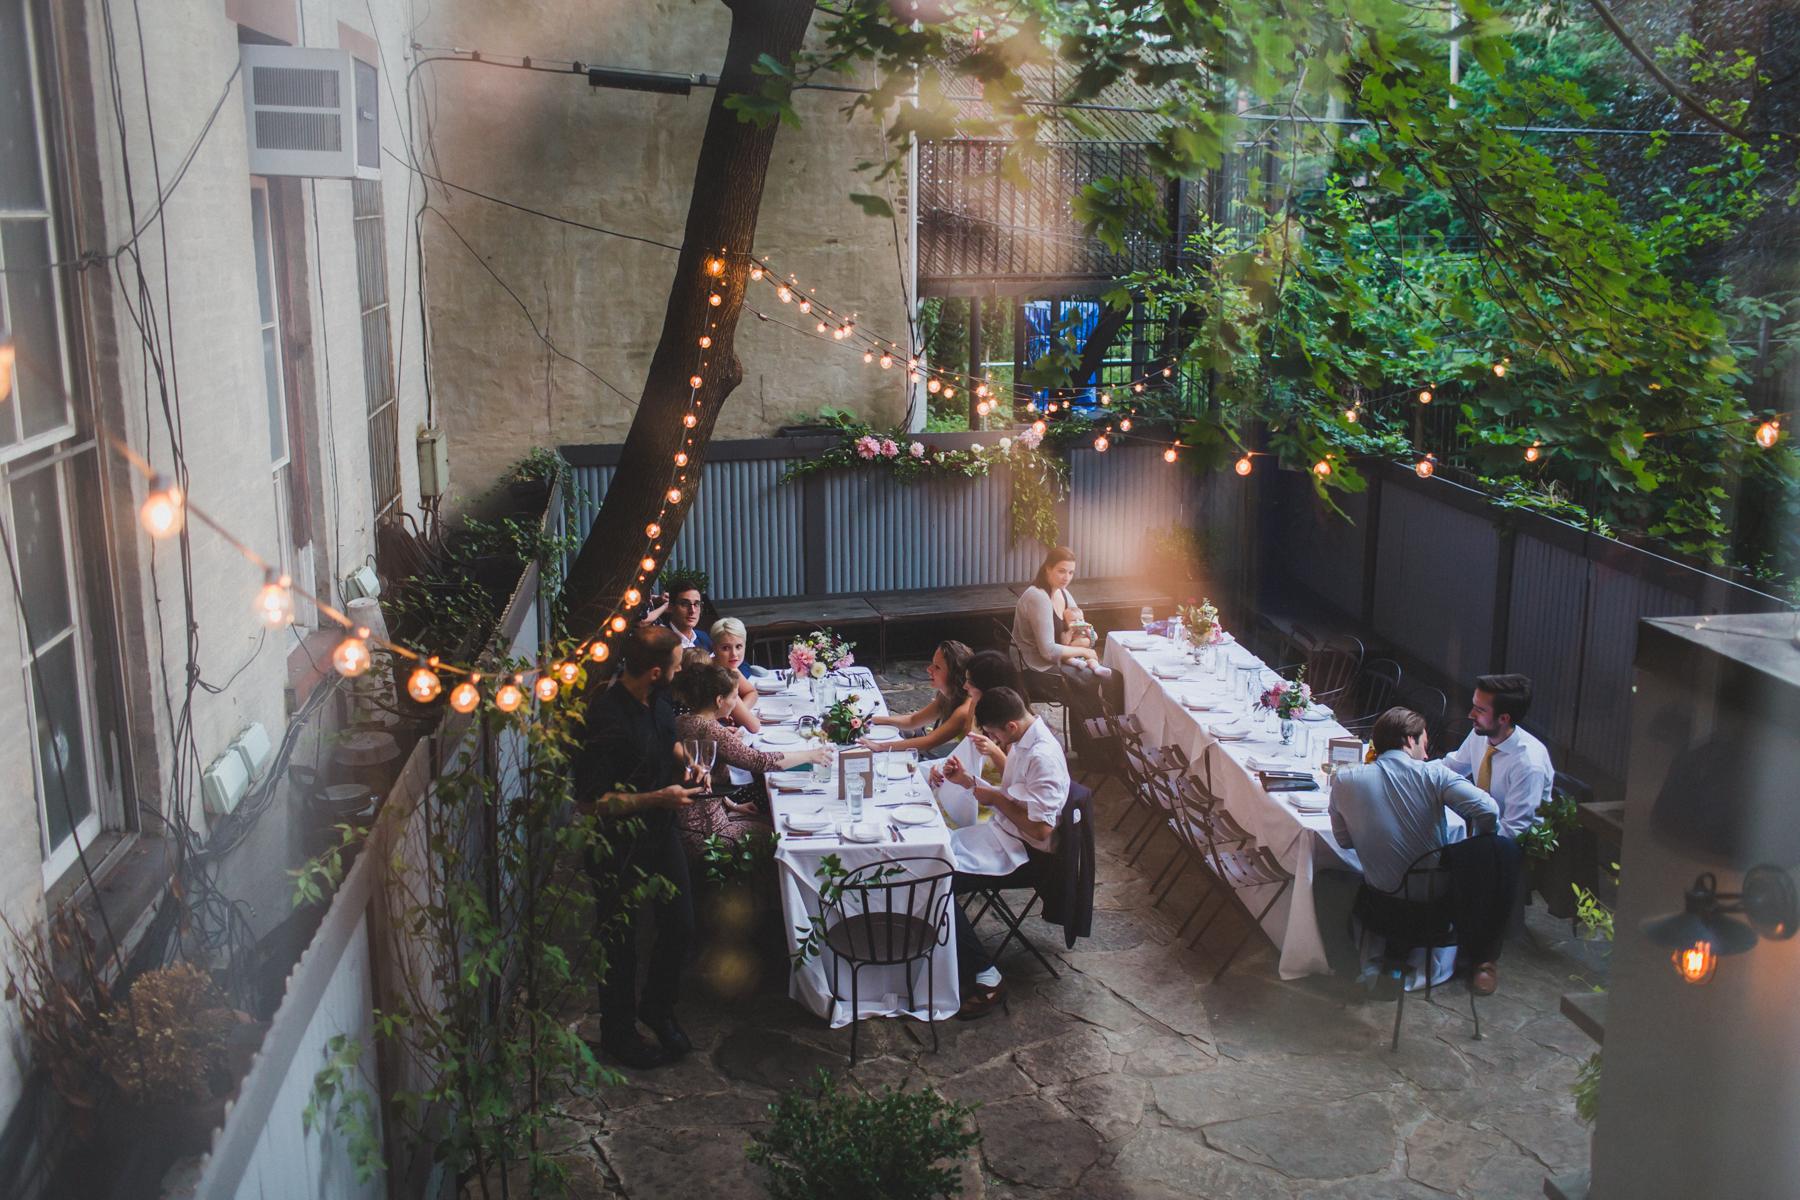 ICI-Restaurant-Fort-Greene-Brooklyn-Intimate-Documentary-Wedding-Photography-Elvira-Kalviste-84.jpg